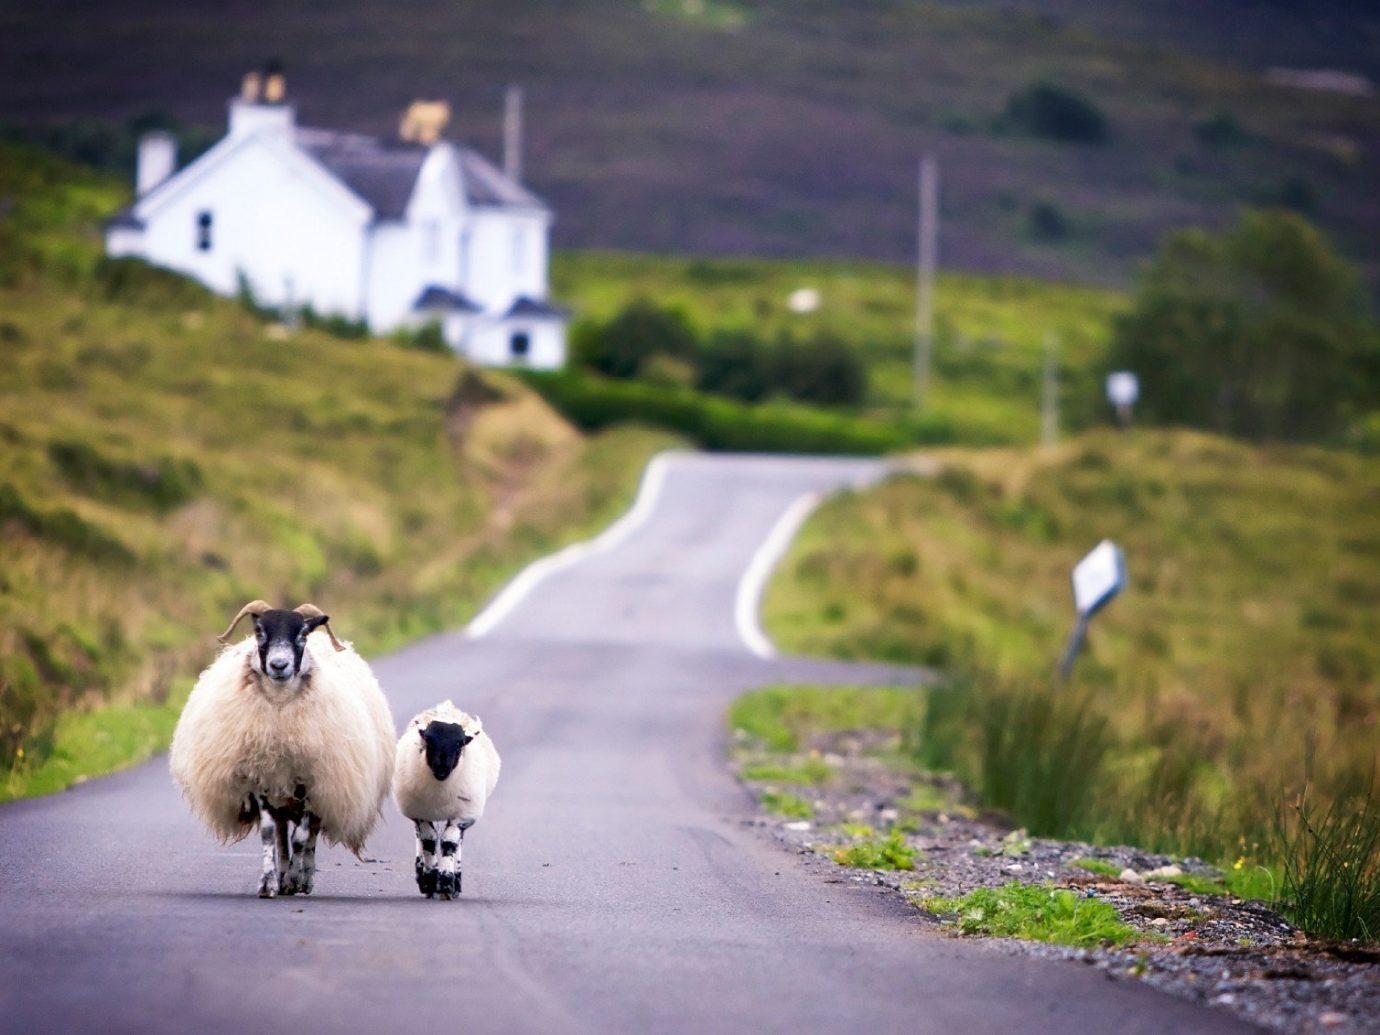 Arts + Culture grass outdoor road sheep mammal Dog rural area dog like mammal